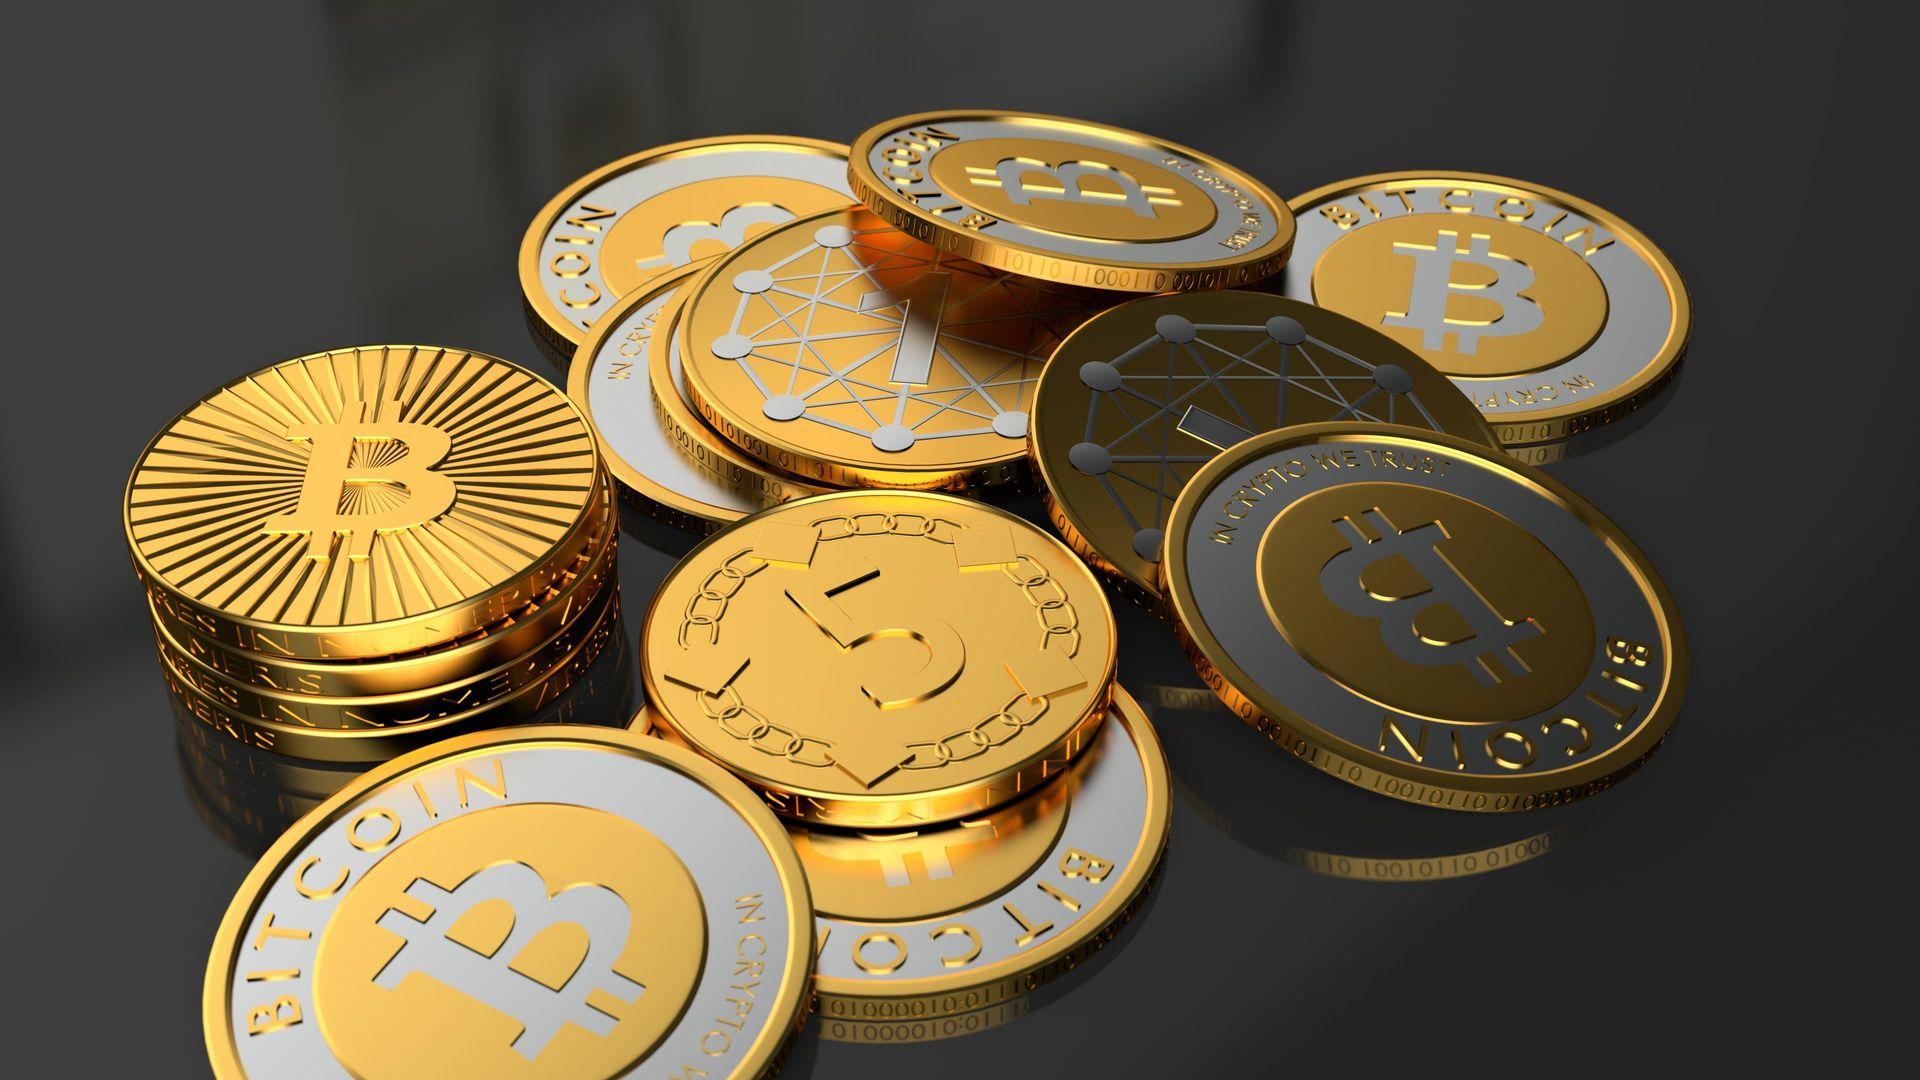 future_money_bitcoin-money